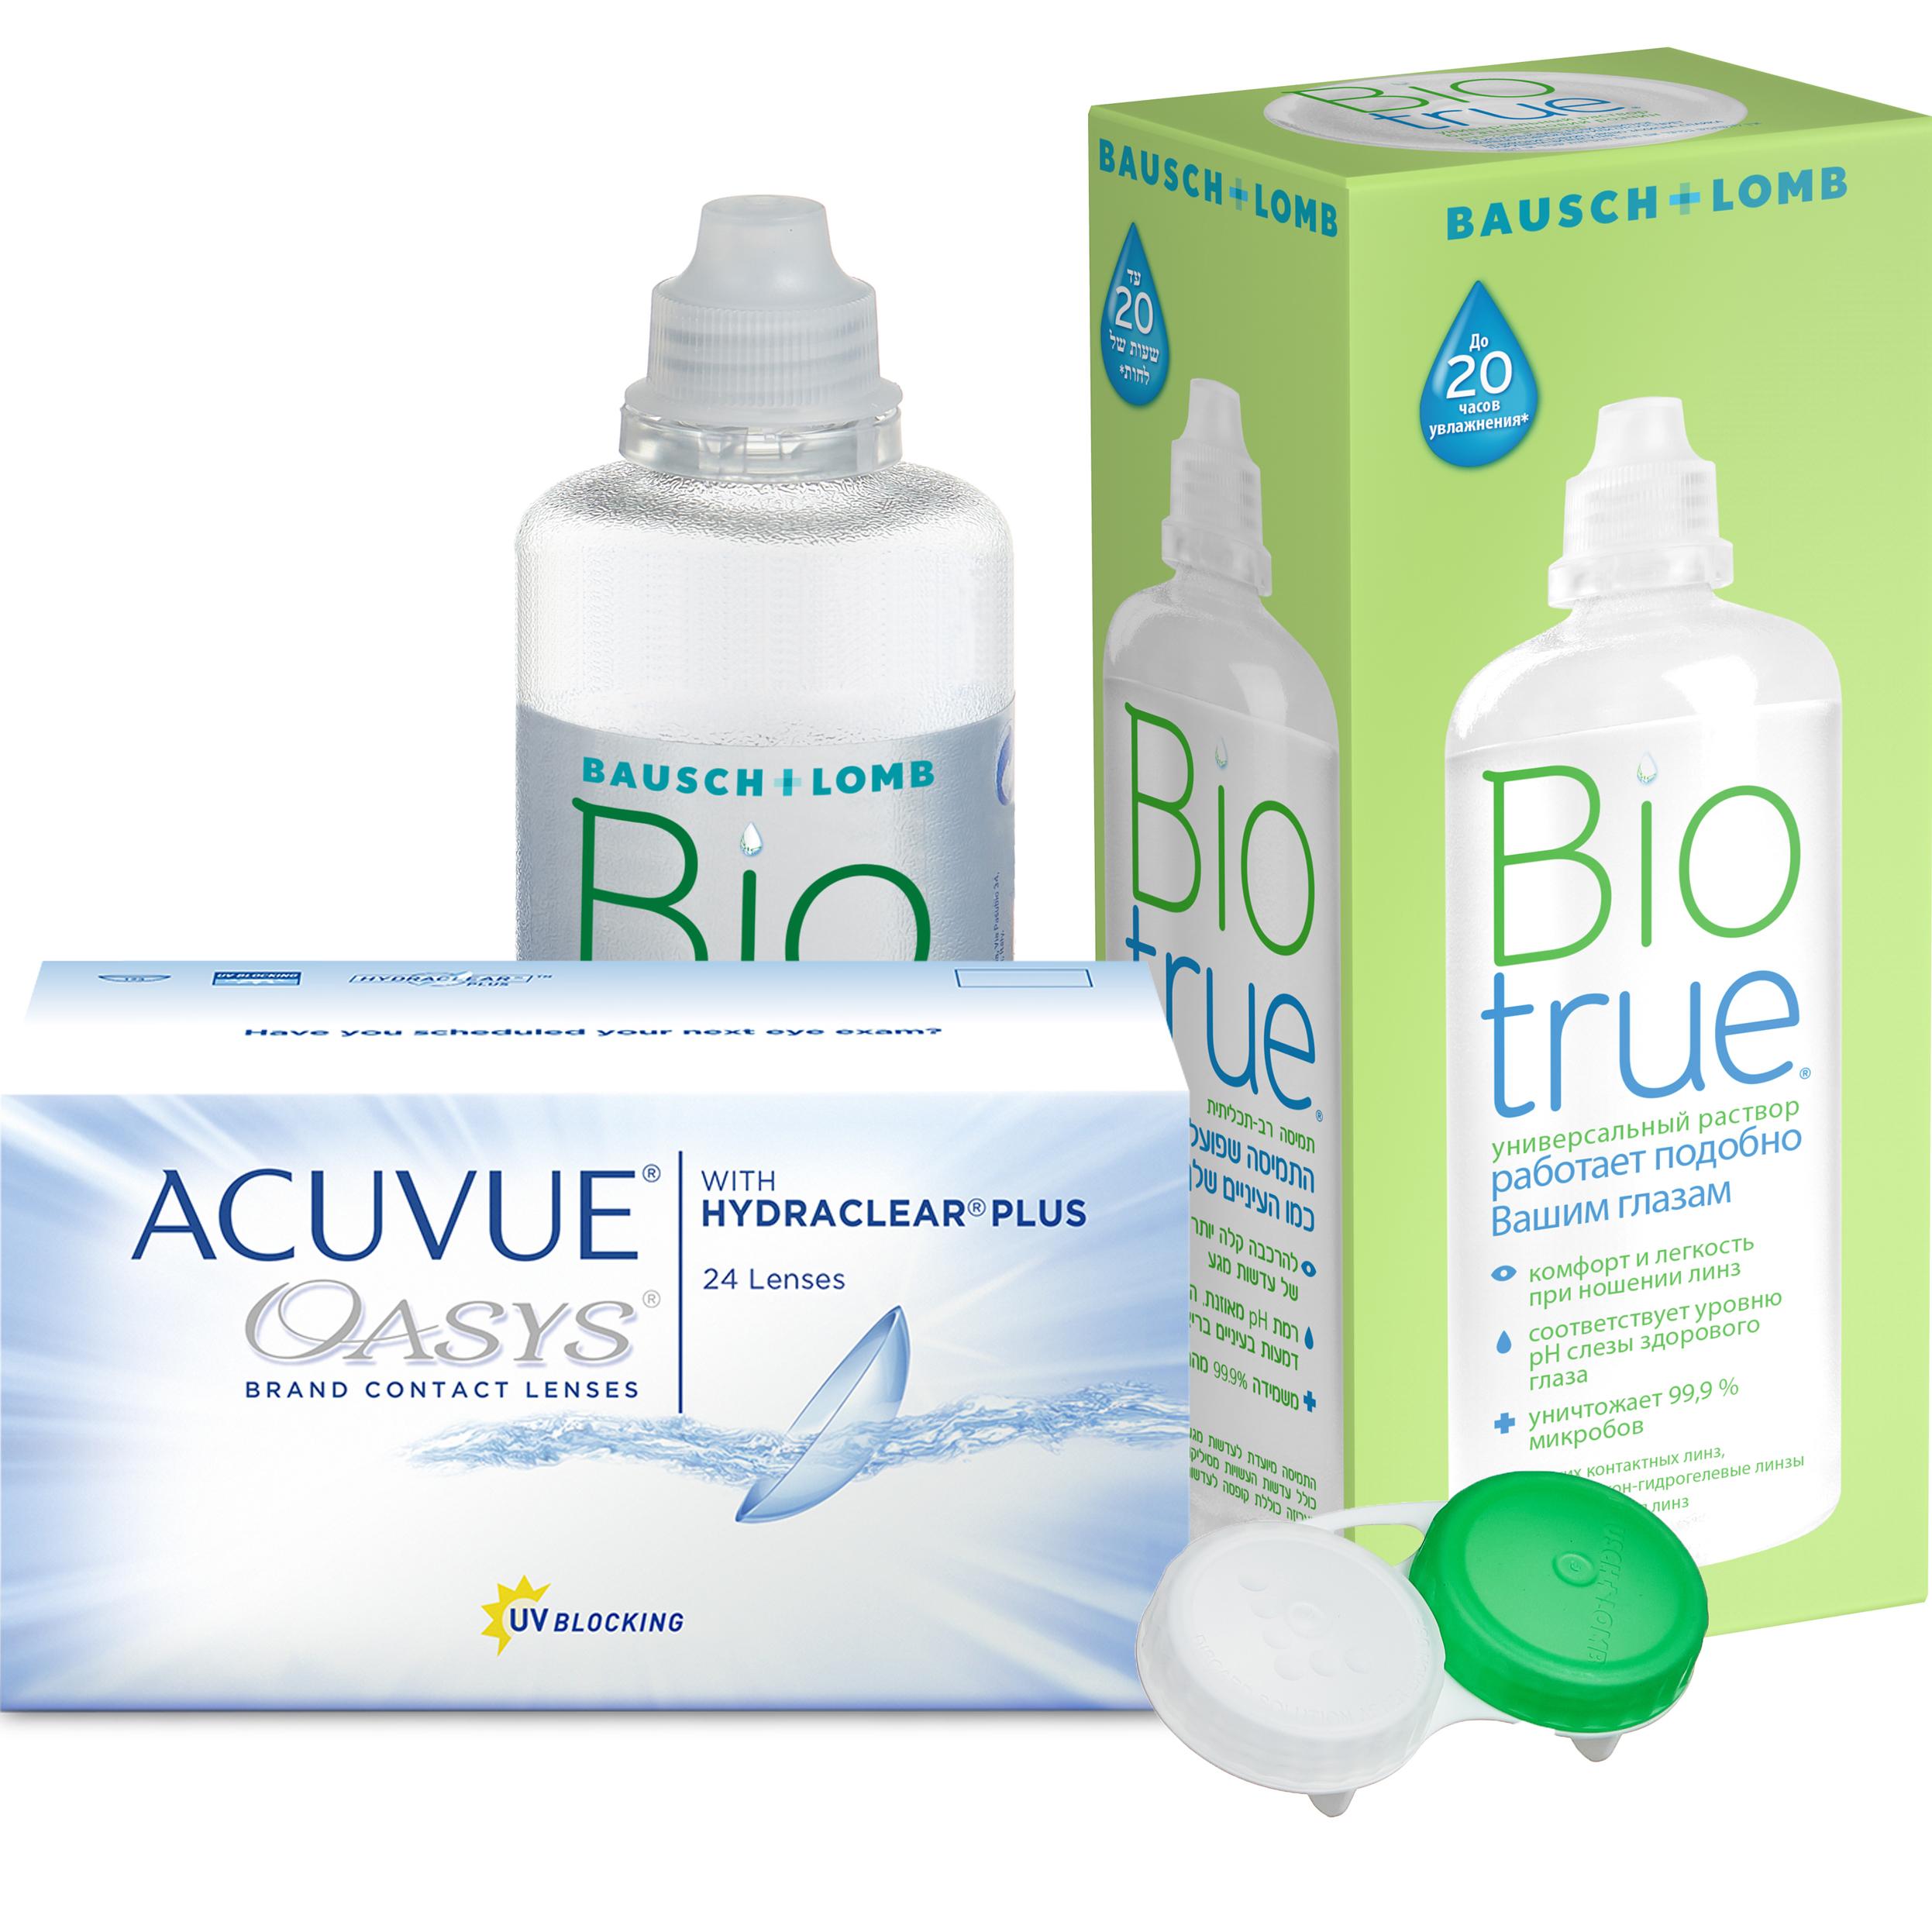 Купить Oasys with Hydraclear Plus 24 линзы + Biotrue, Контактные линзы Acuvue Oasys with Hydraclear Plus 24 линзы R 8.4 -3, 75 + Biotrue 300 мл